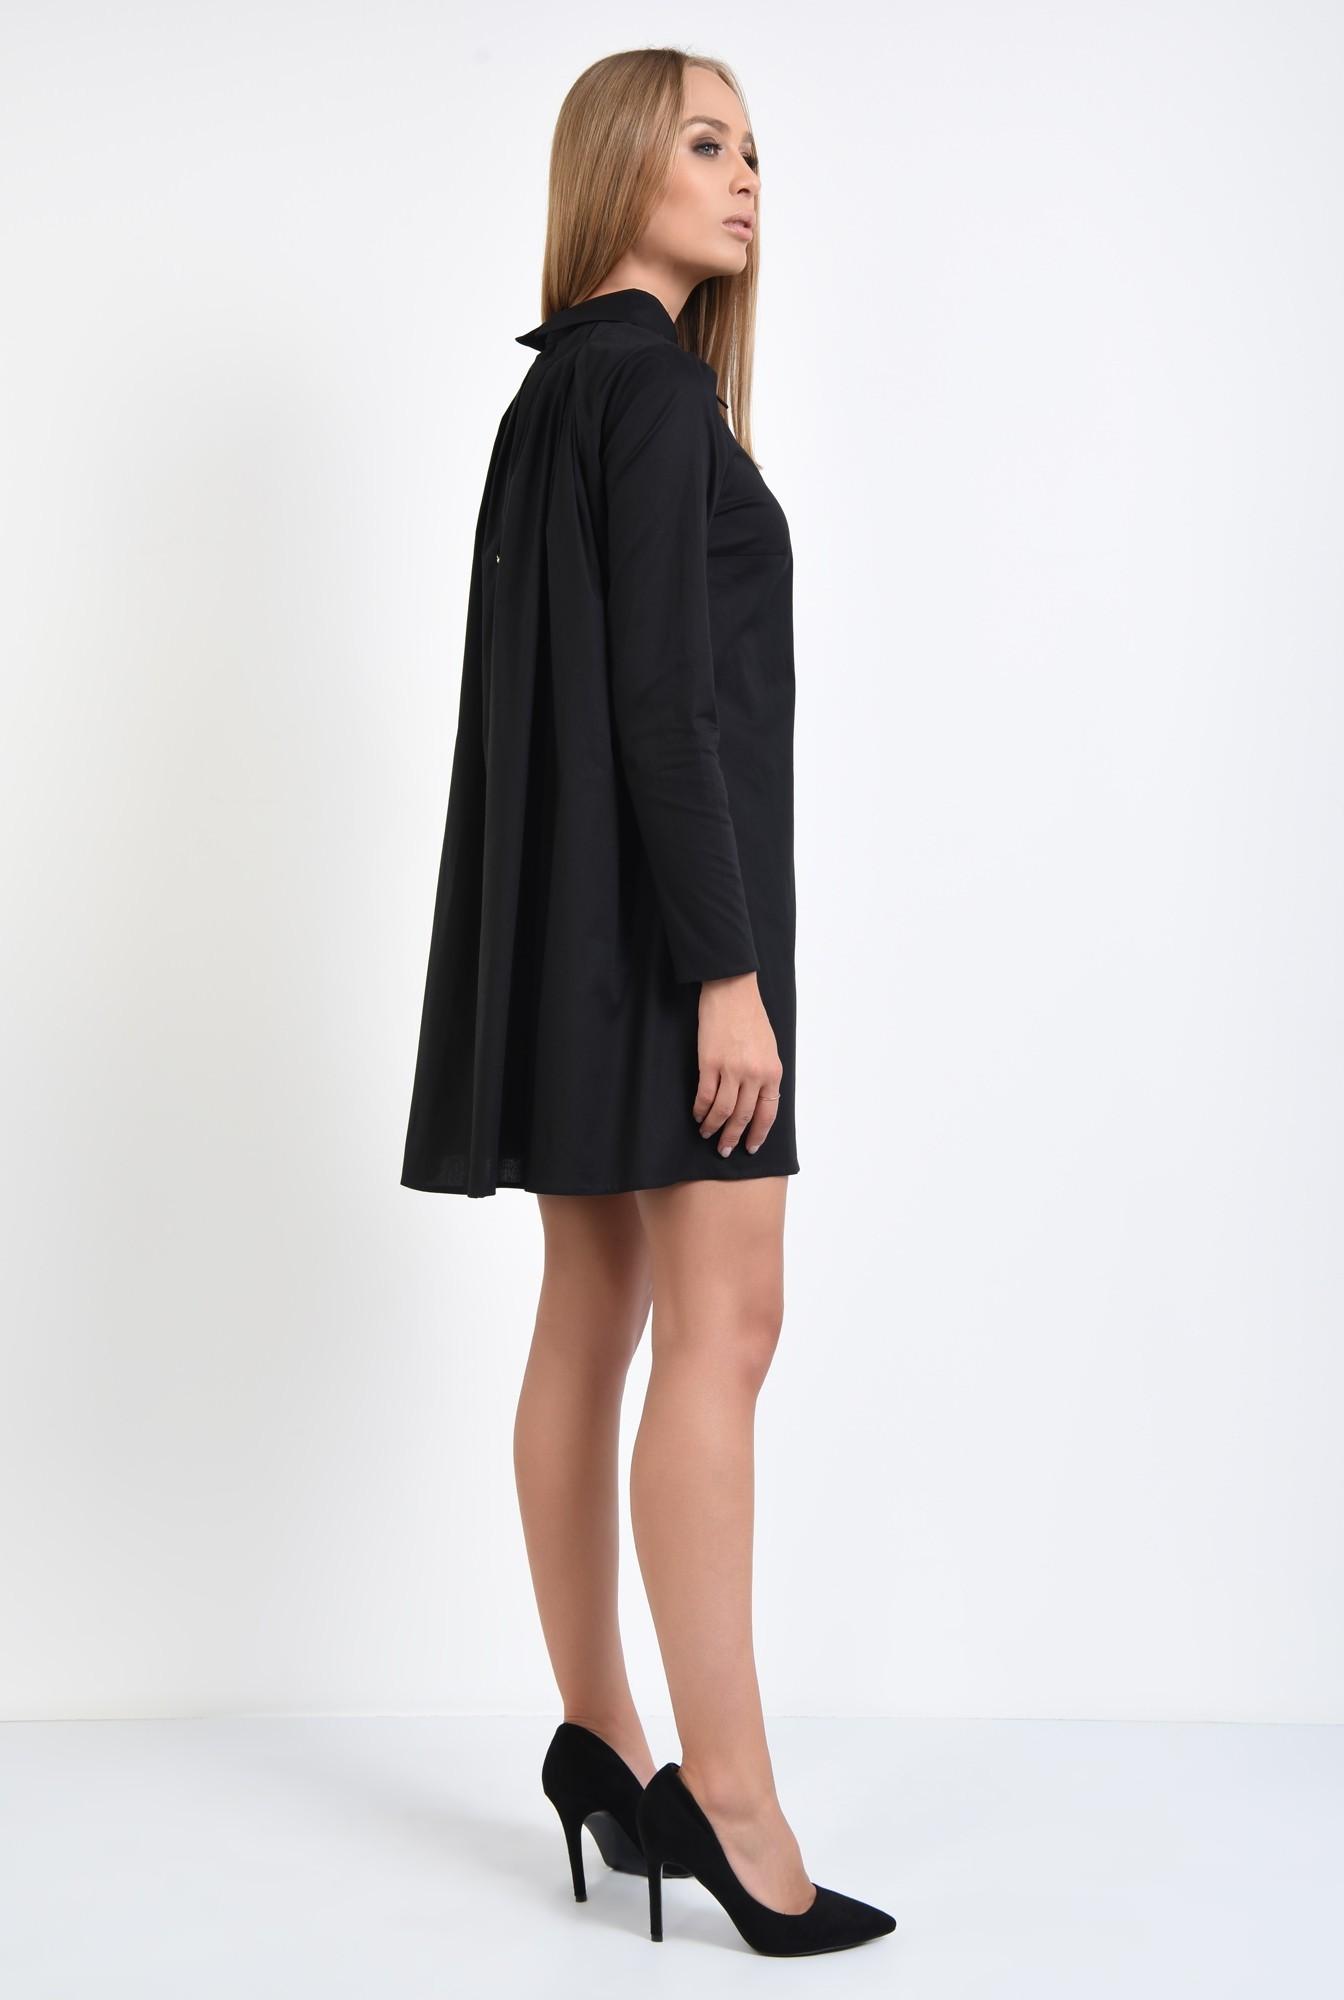 1 - rochie casual, stil camasa, guler ascutit, rochii online